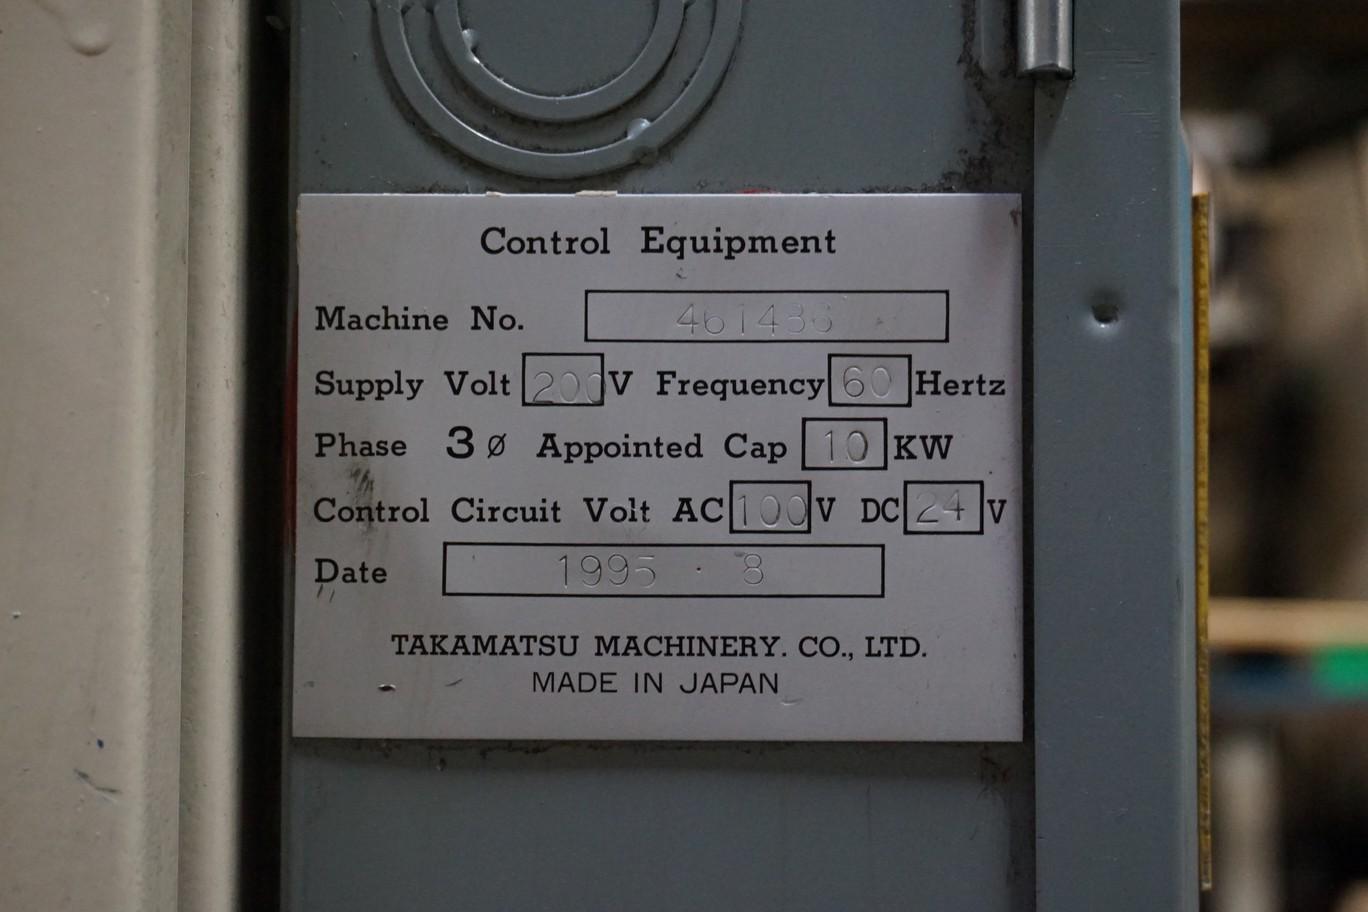 Takamatsu Model MT CNC Lathe 200/220V c/w Transformer (L66) - Image 7 of 7